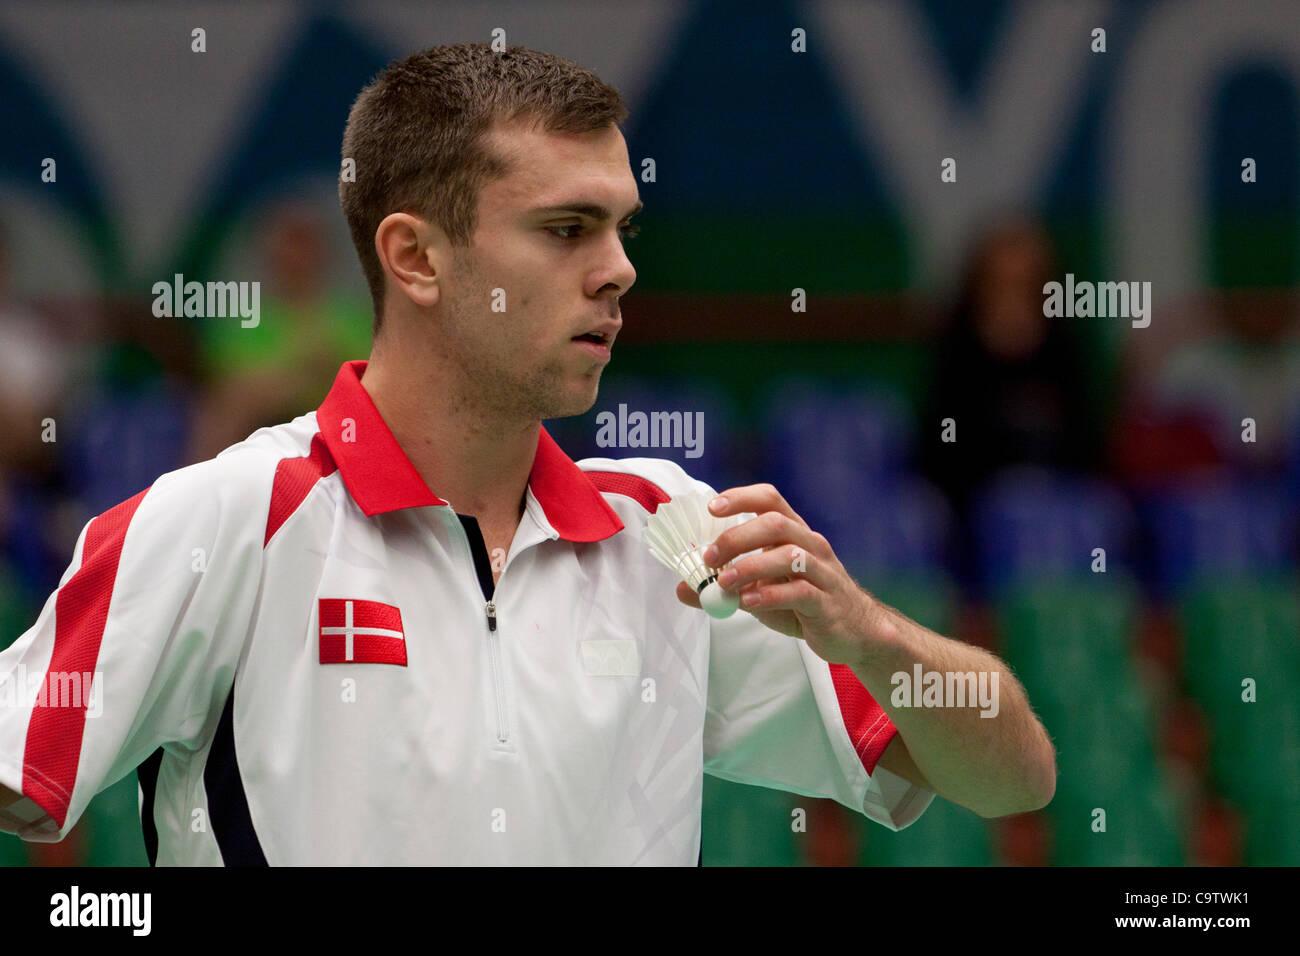 AMSTERDAM, THE NETHERLANDS, 19/02/2012. Badminton player Jan Ø. Jørgensen (Denmark, pictured) wins his - Stock Image